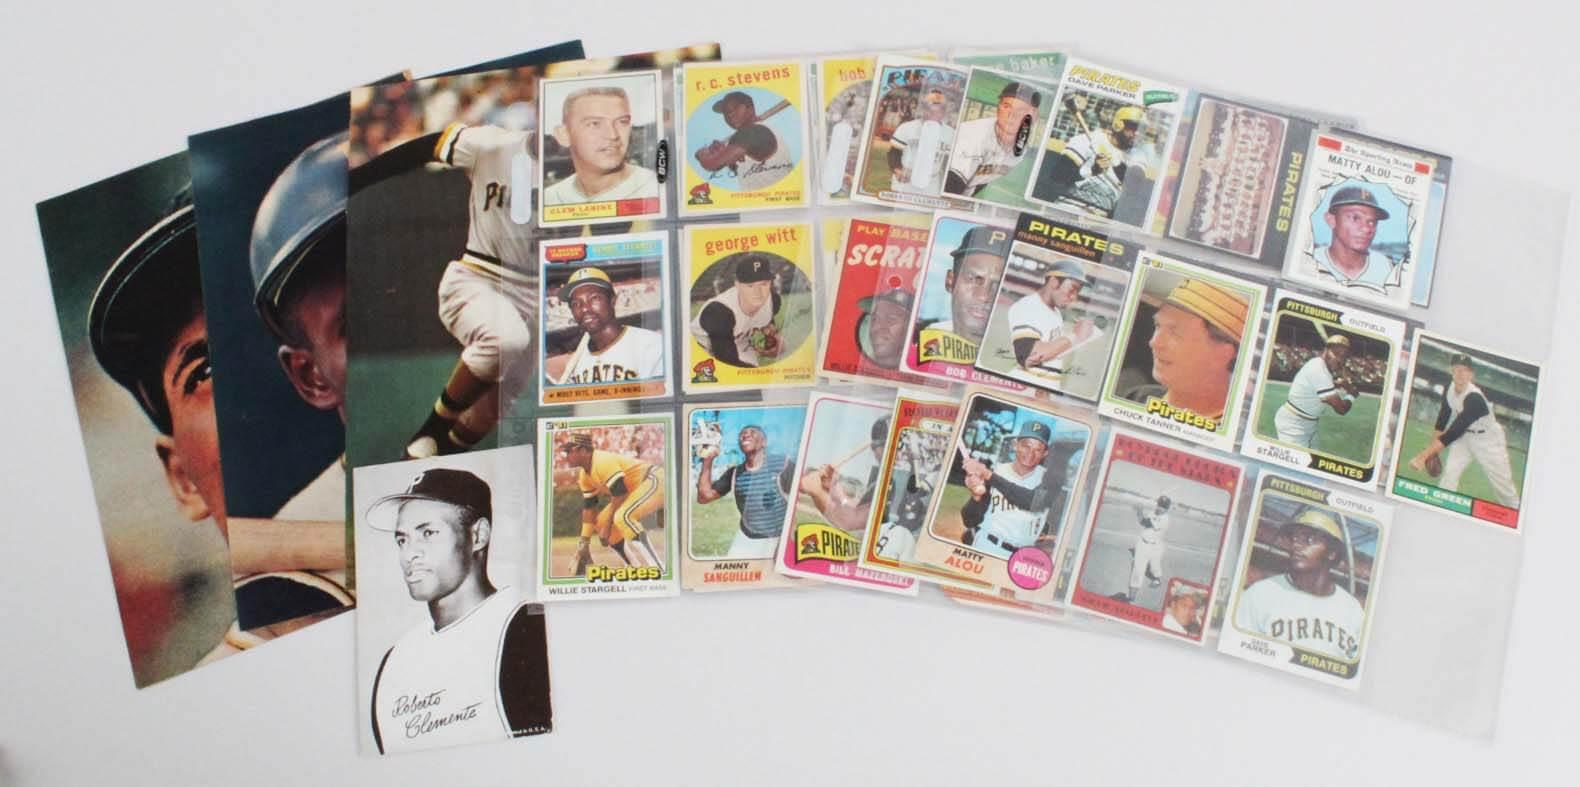 Pittsburgh Pirates Vintage Baseball Card Lot (49) - Roberto Clemente, Willie Stargell, etc.